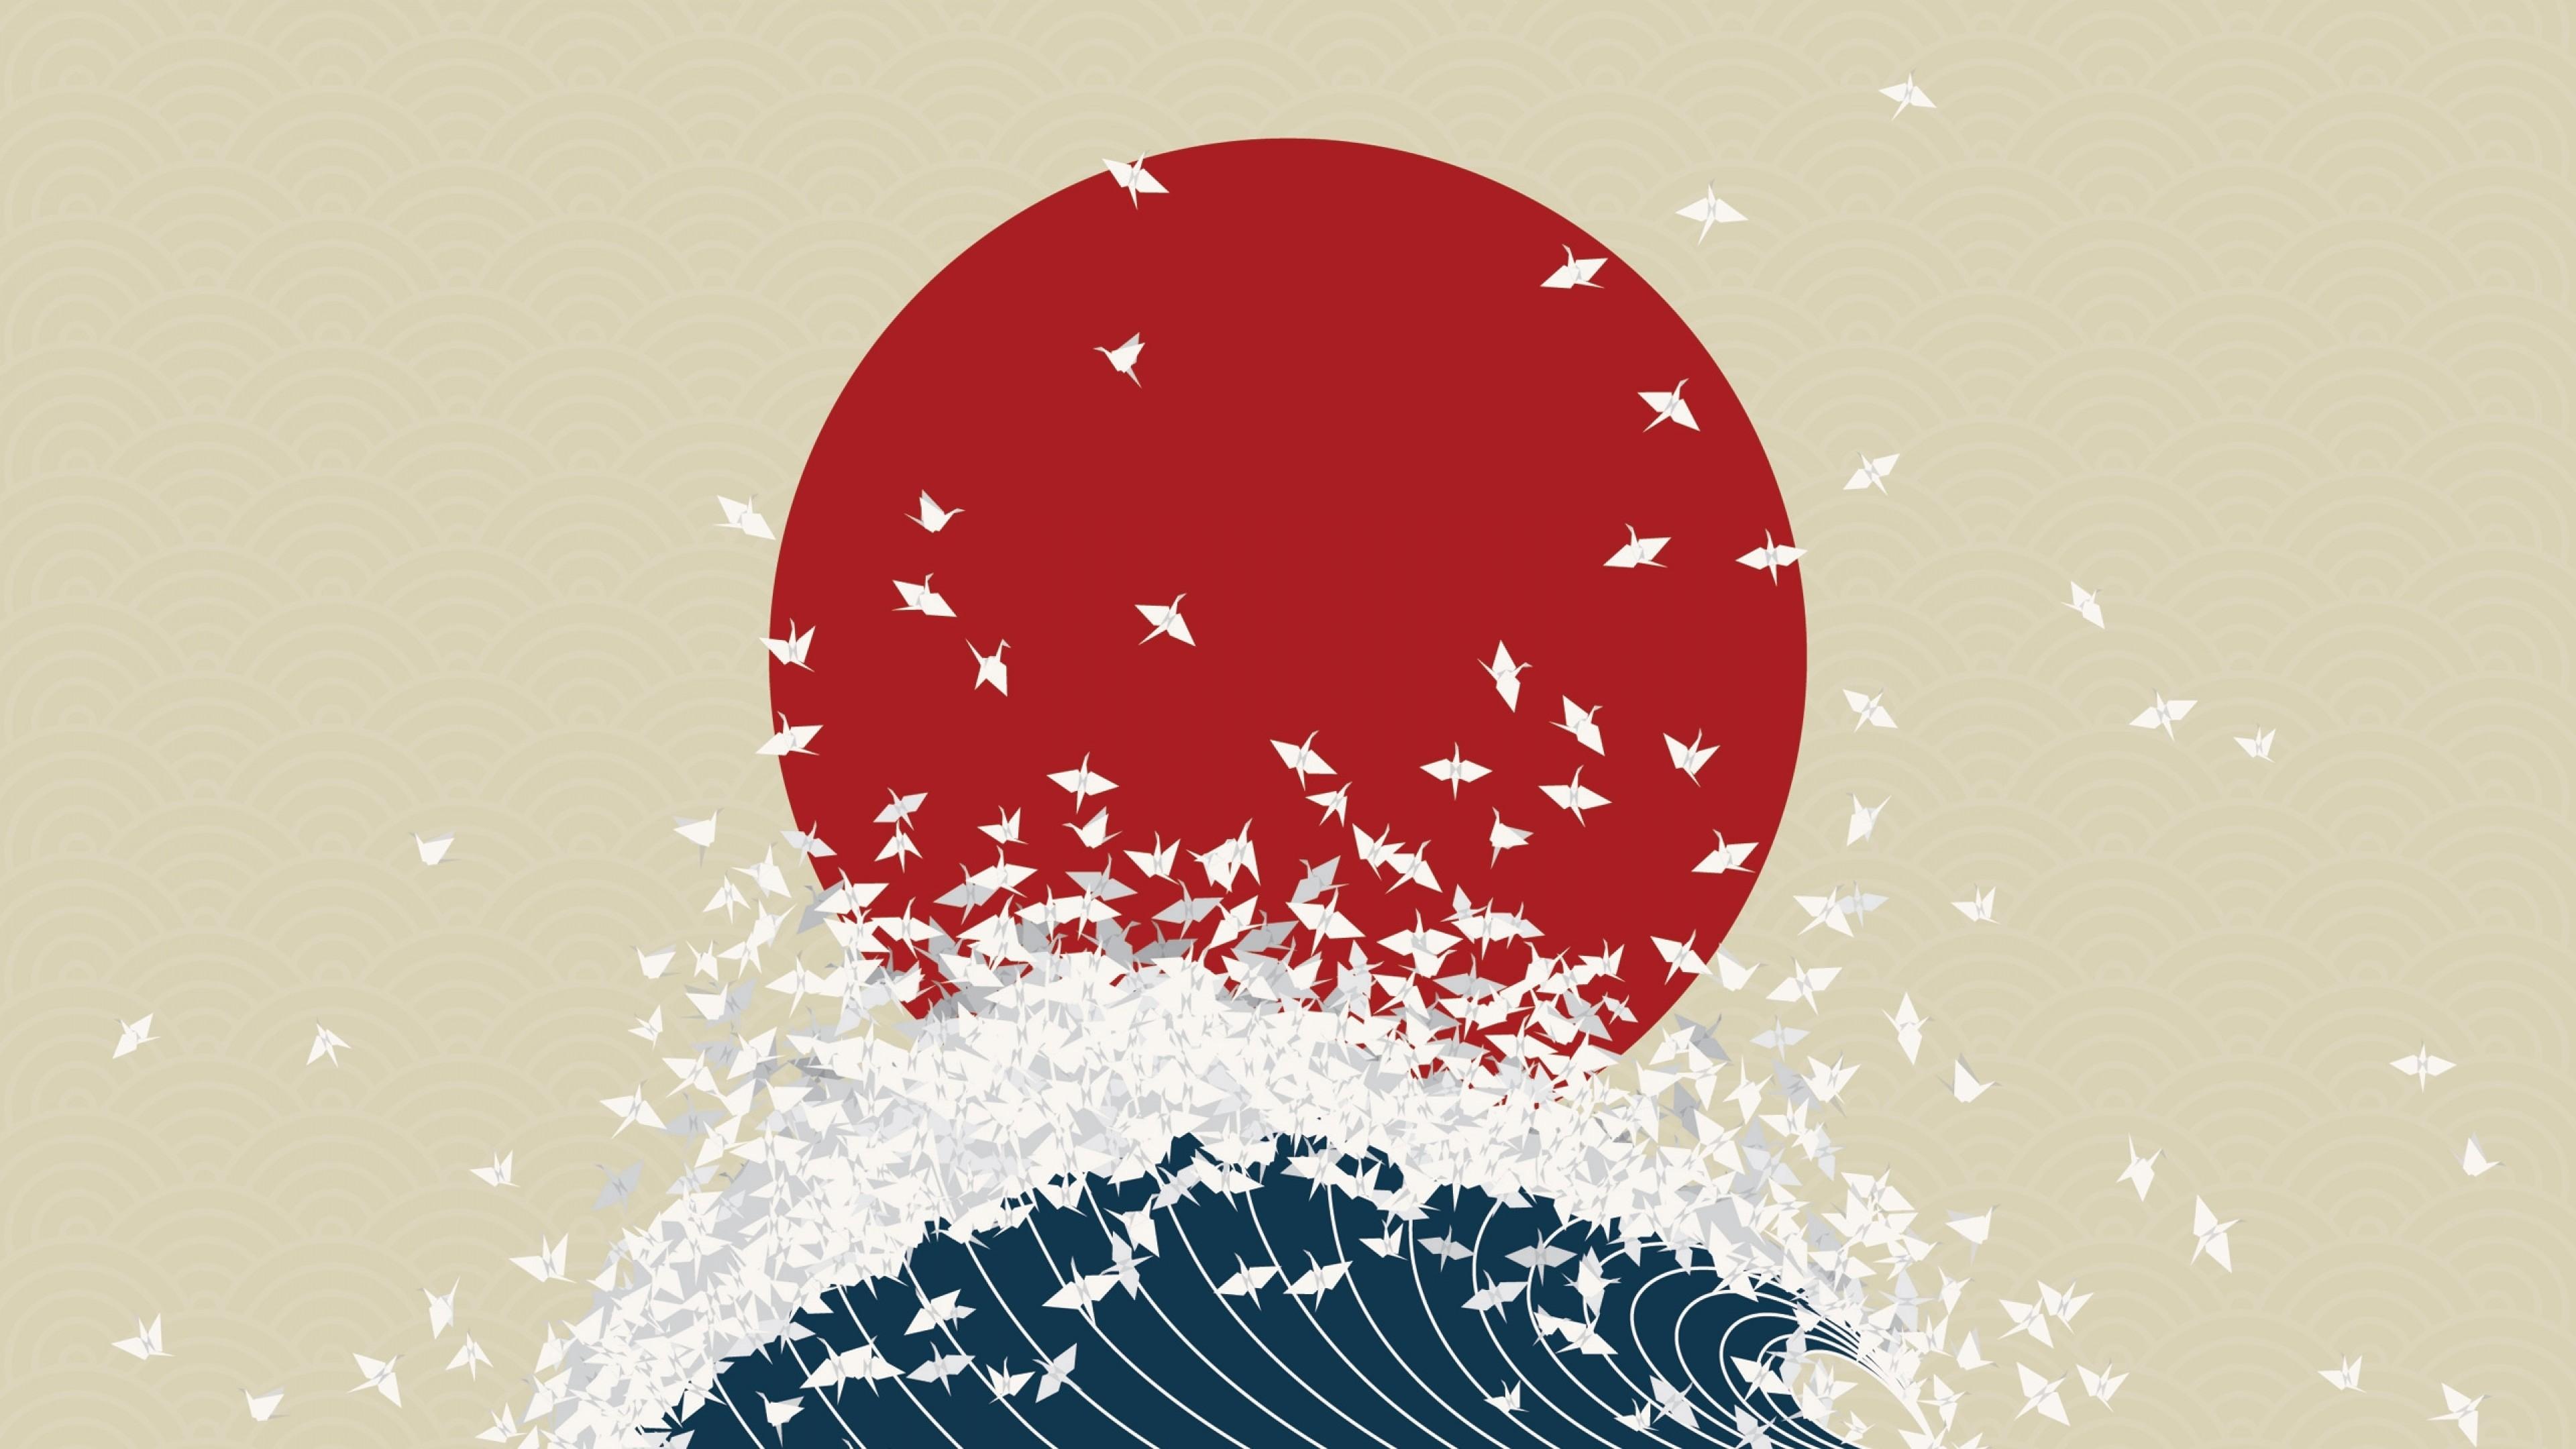 Wallpaper minimalism, origami, japan, rising sun, wave